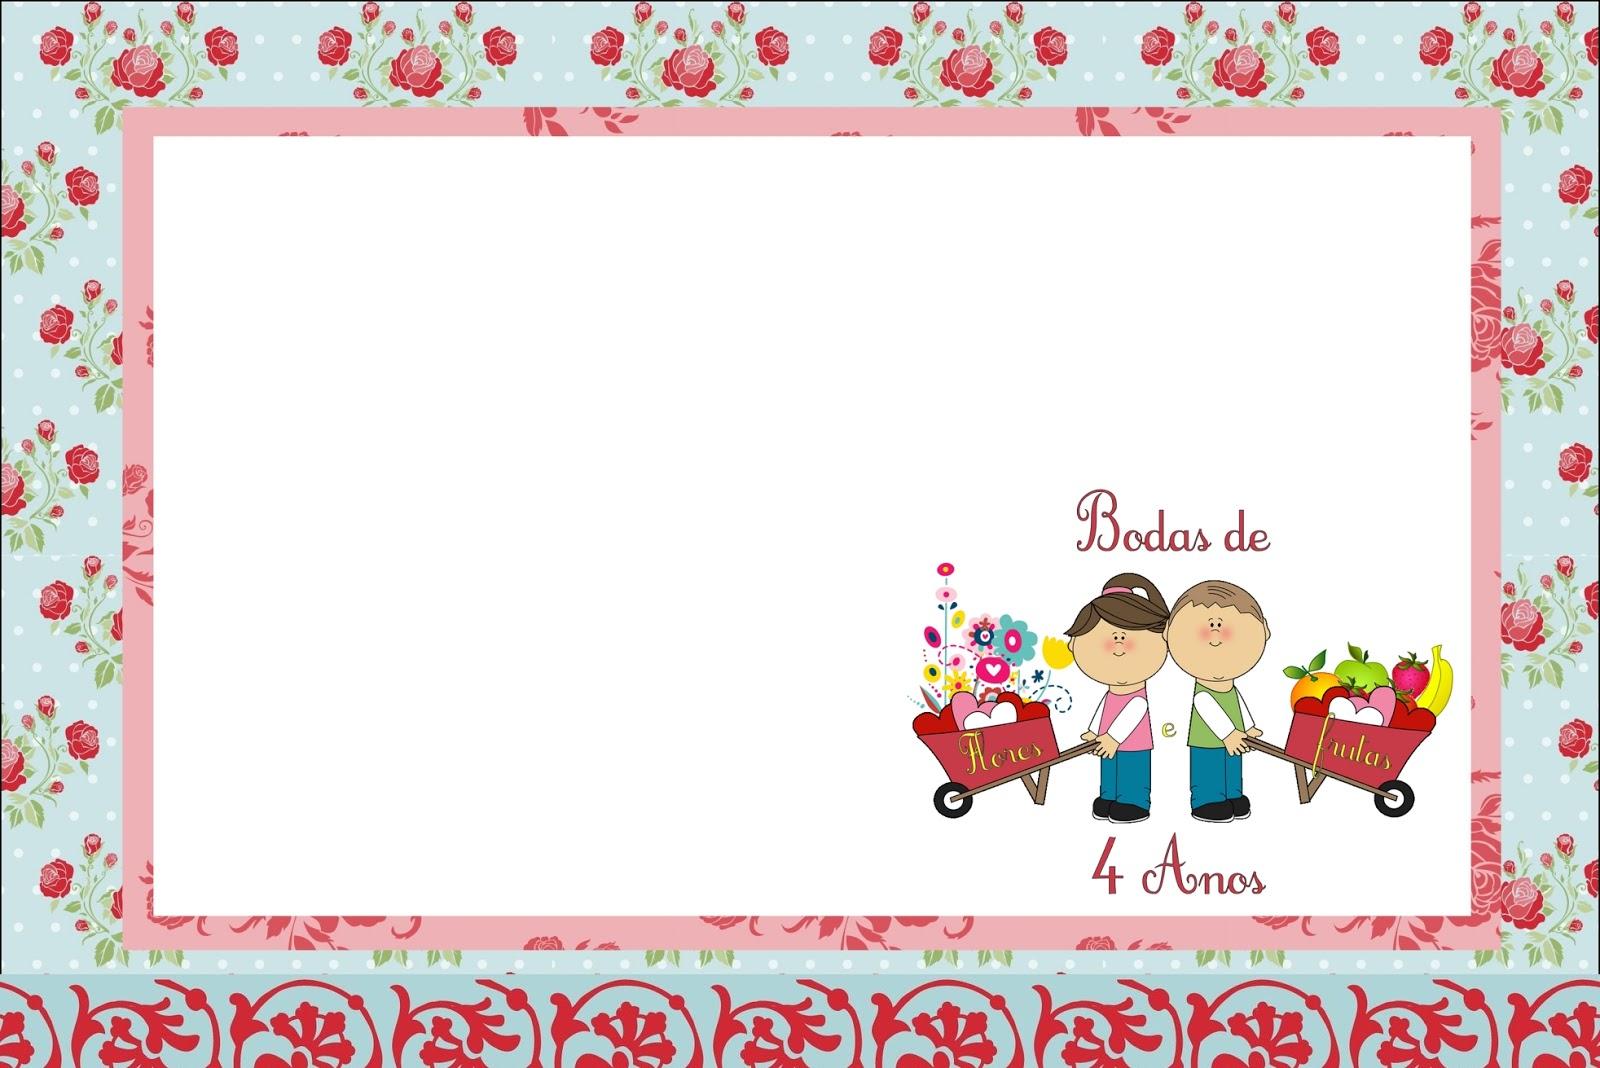 R  Tulo Tic Tac Mini Kit Bodas E Flores E Frutas   4 Anos